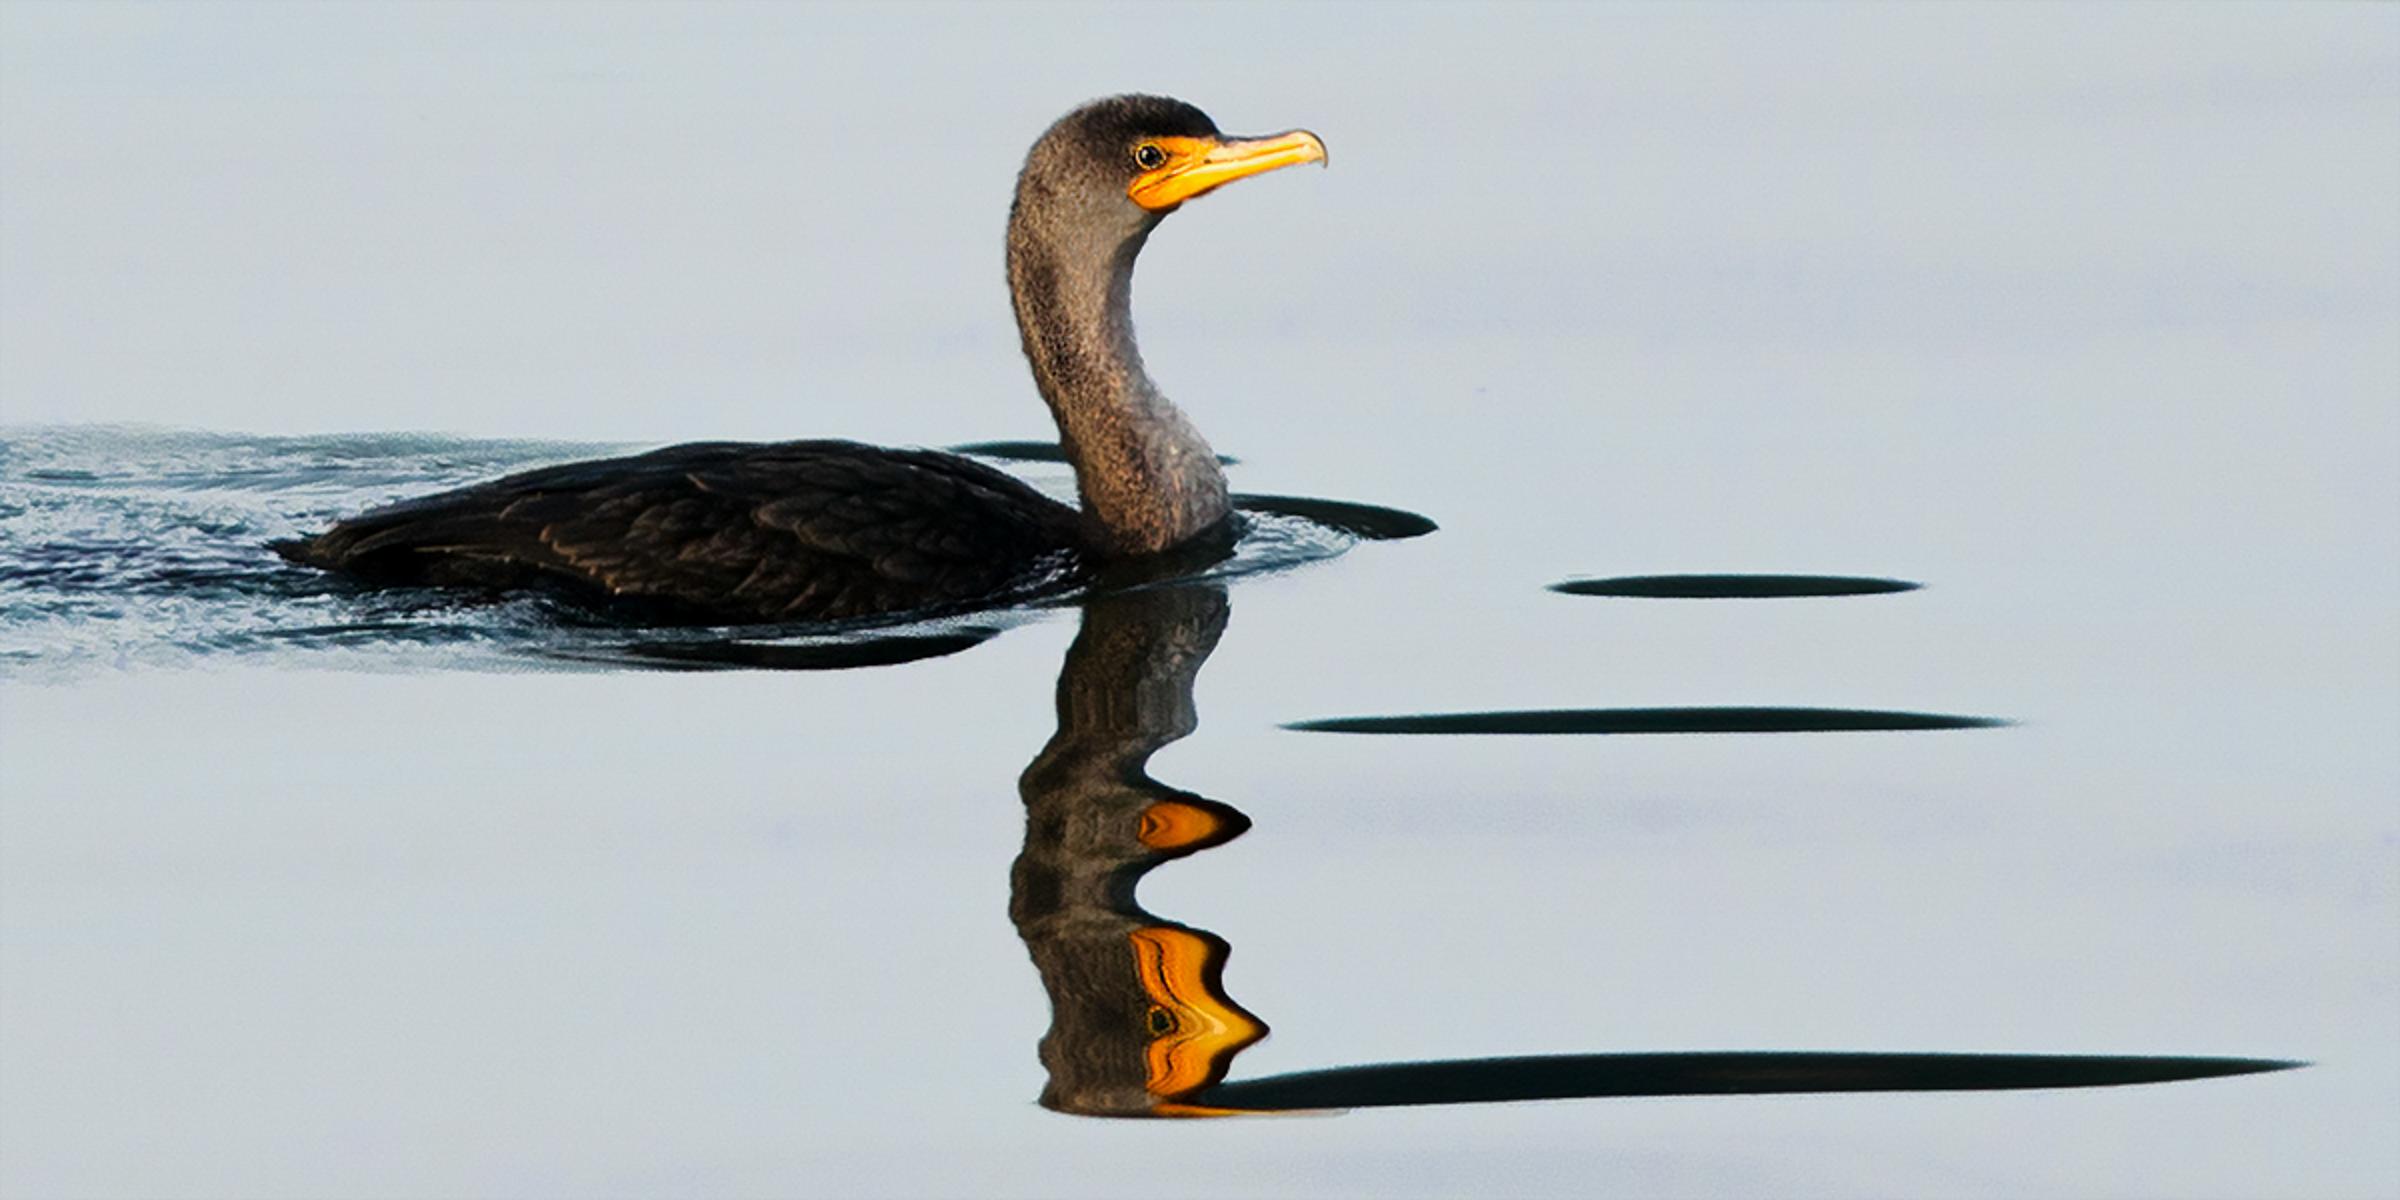 Double-crested Cormorant. Photo: Roger VanGelder/Audubon Photography Awards.